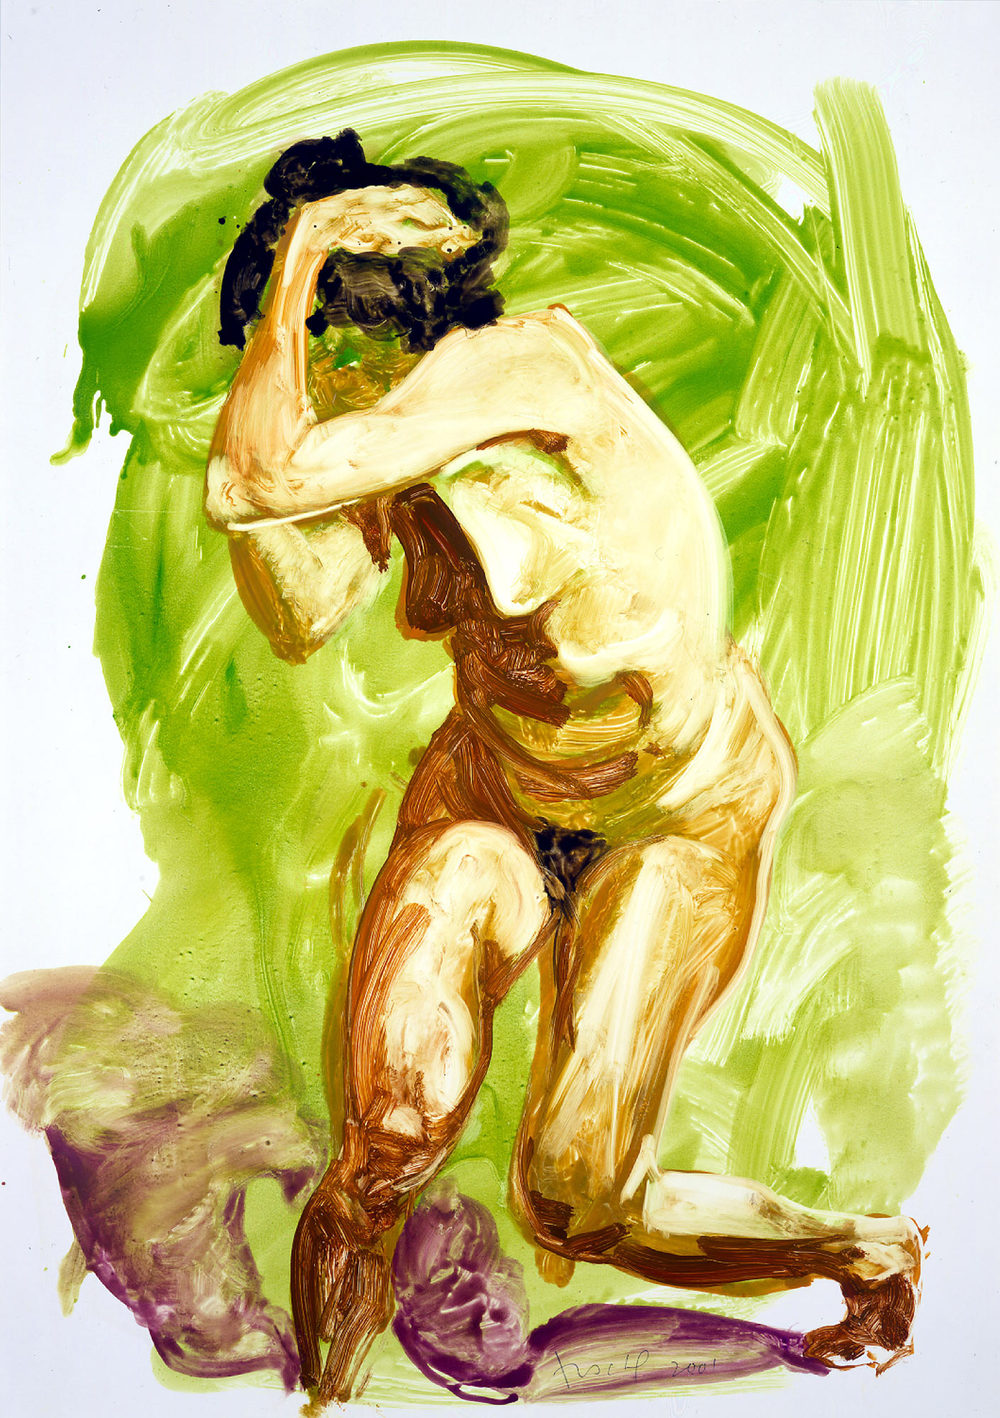 Untitled (Cringing/Twisting), 2001.